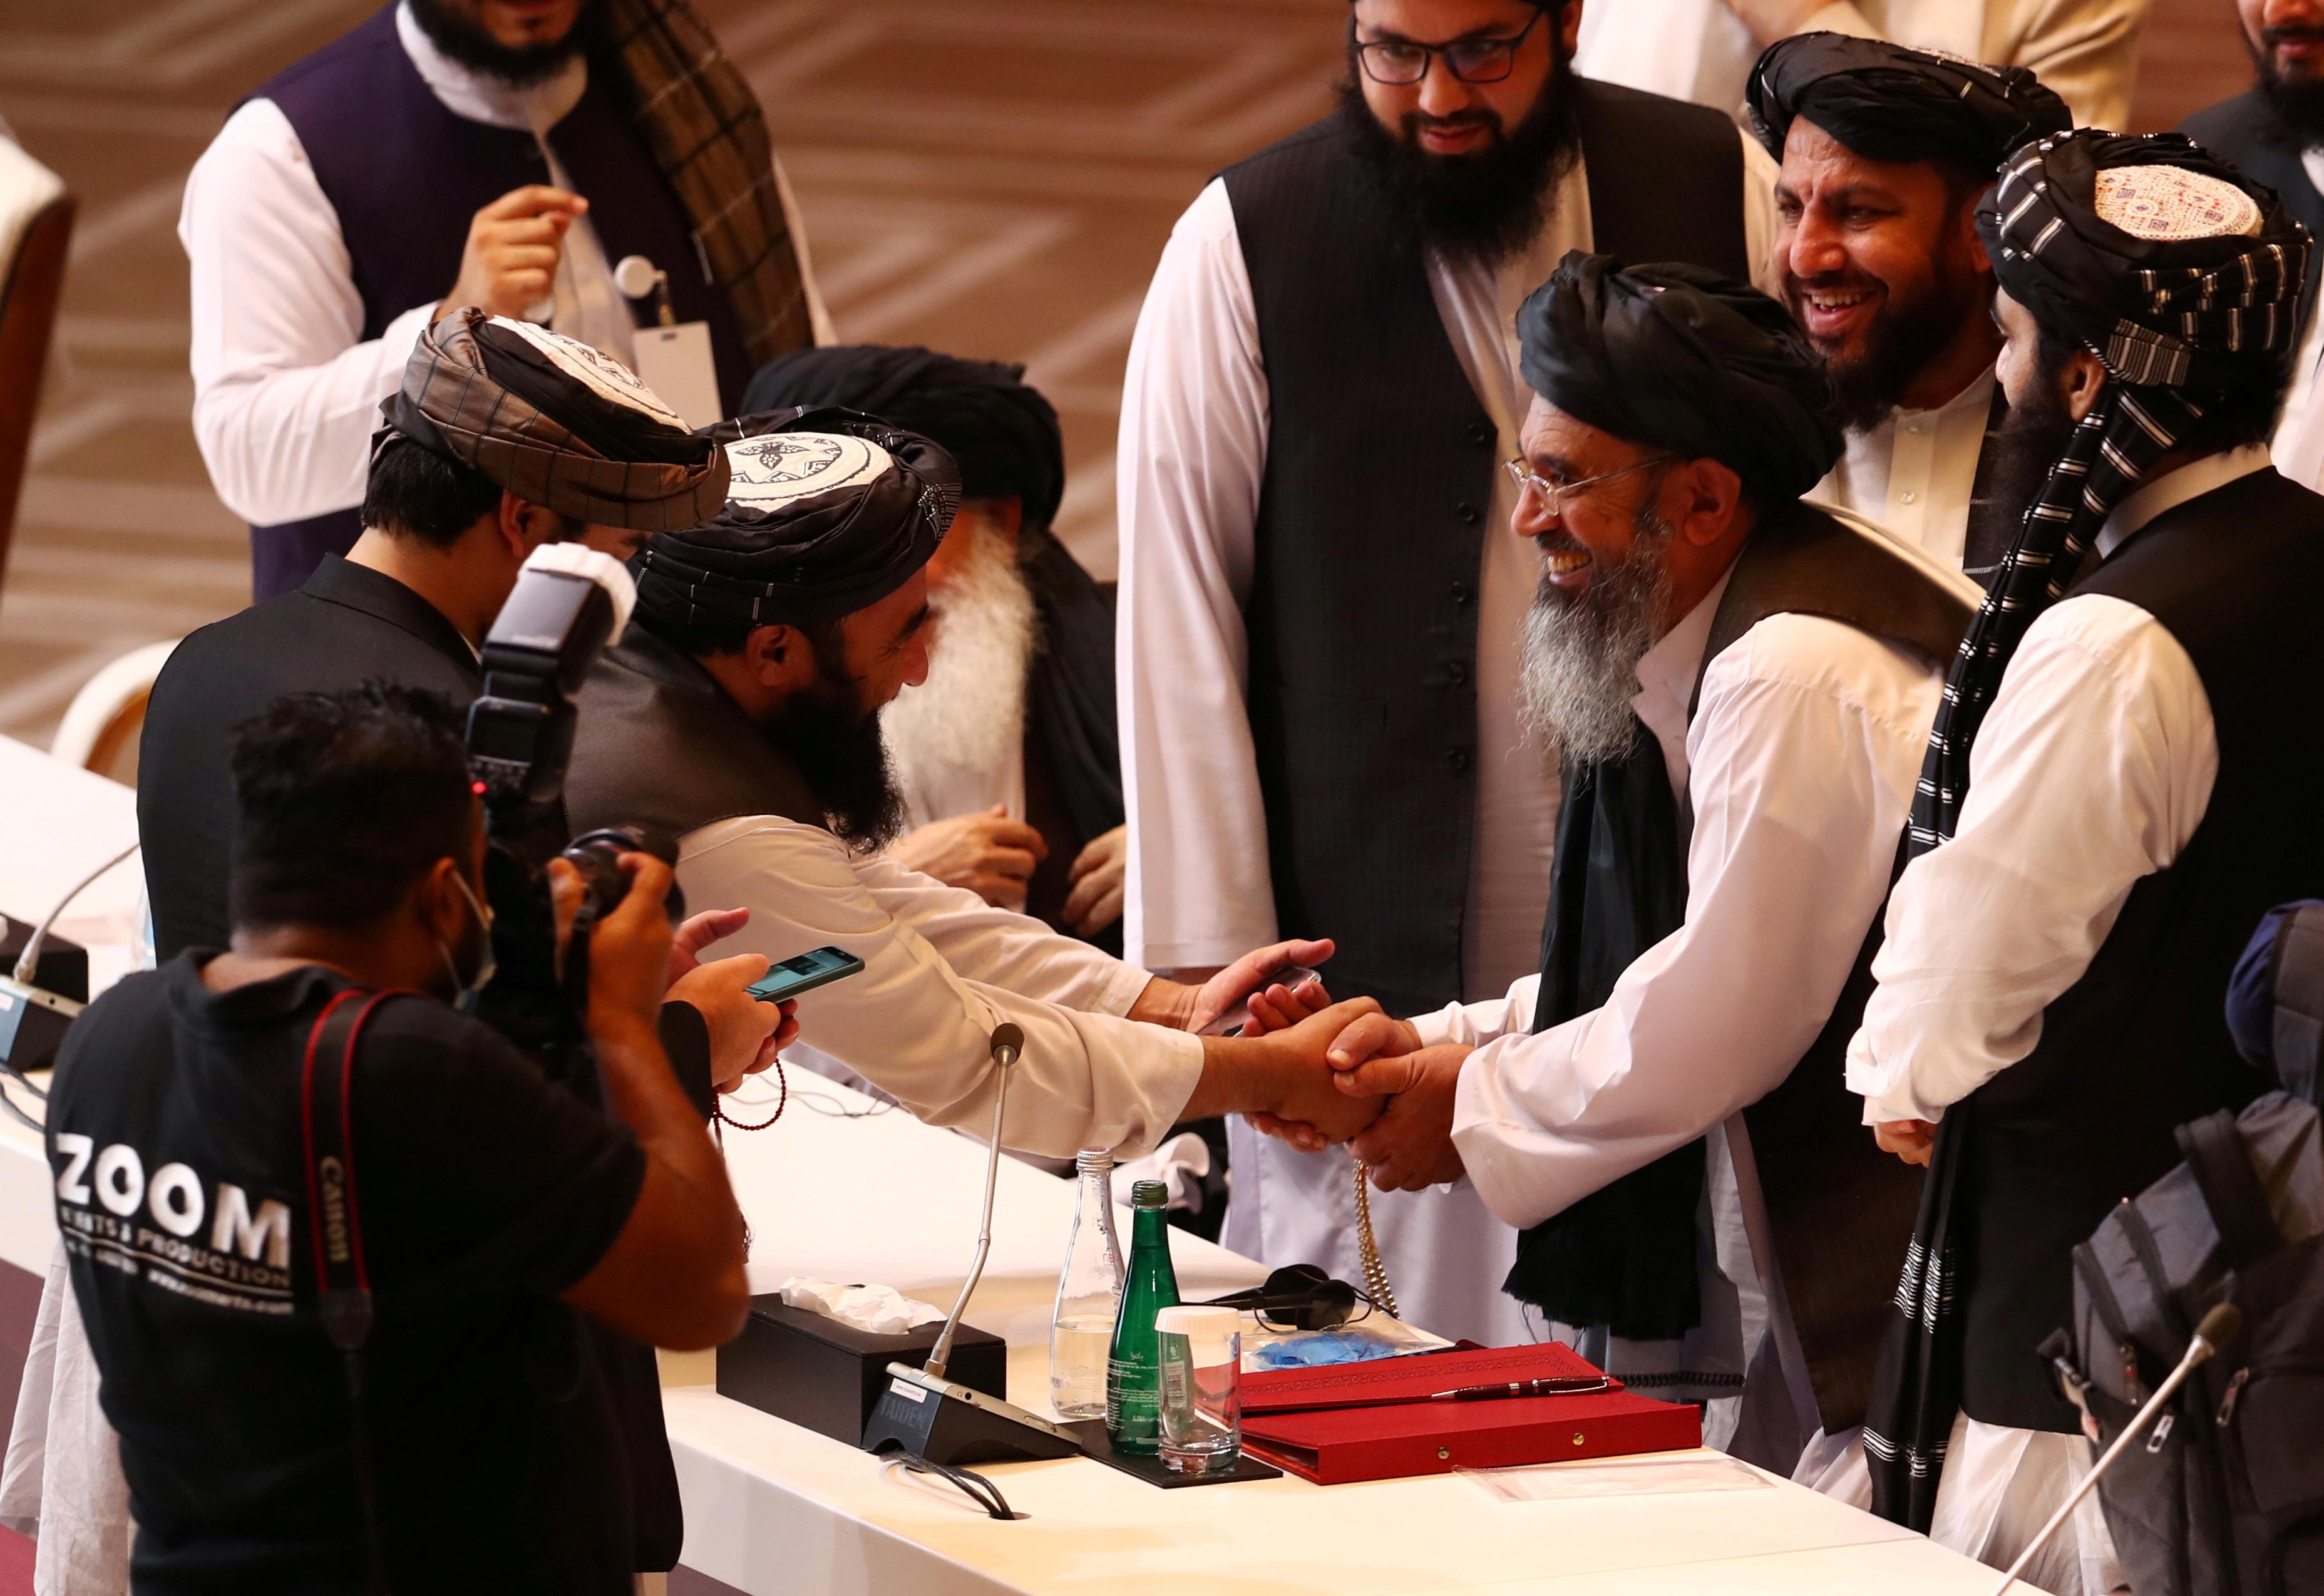 Taliban delegates shake hands during talks between the Afghan government and Taliban insurgents in Doha, Qatar September 12, 2020. REUTERS/Ibraheem al Omari/File Photo